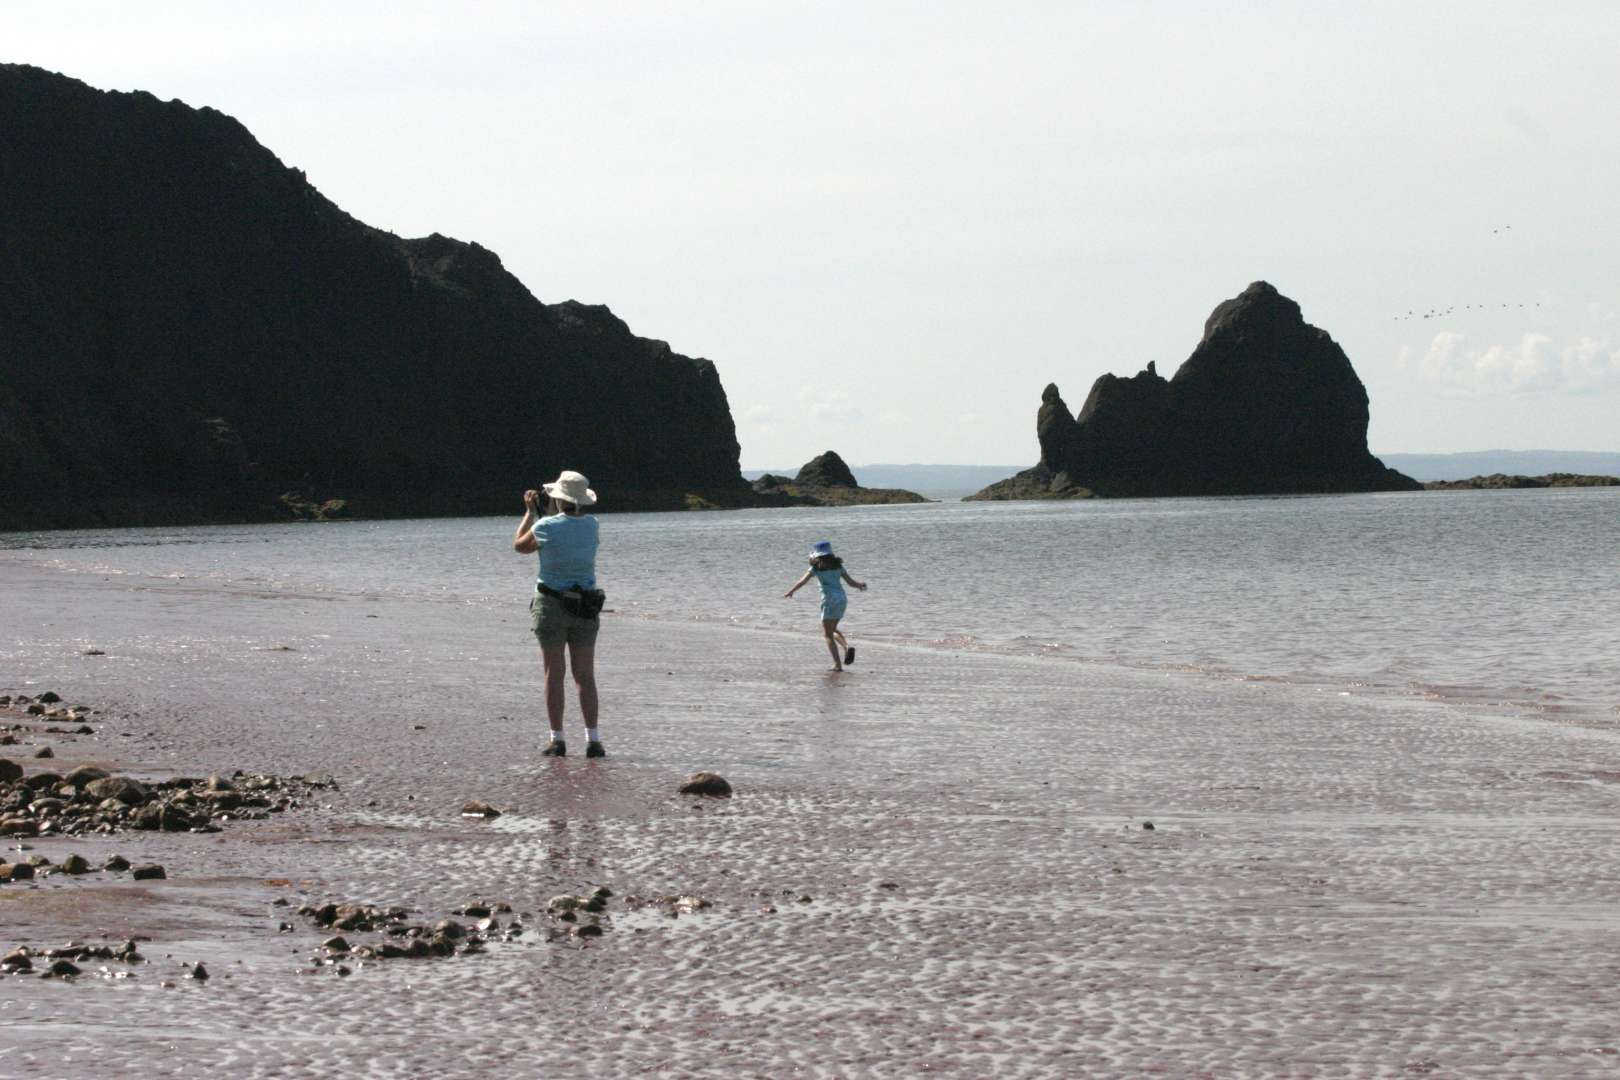 People explore the beach at Five Island Beach near Economy, Nova Scotia.